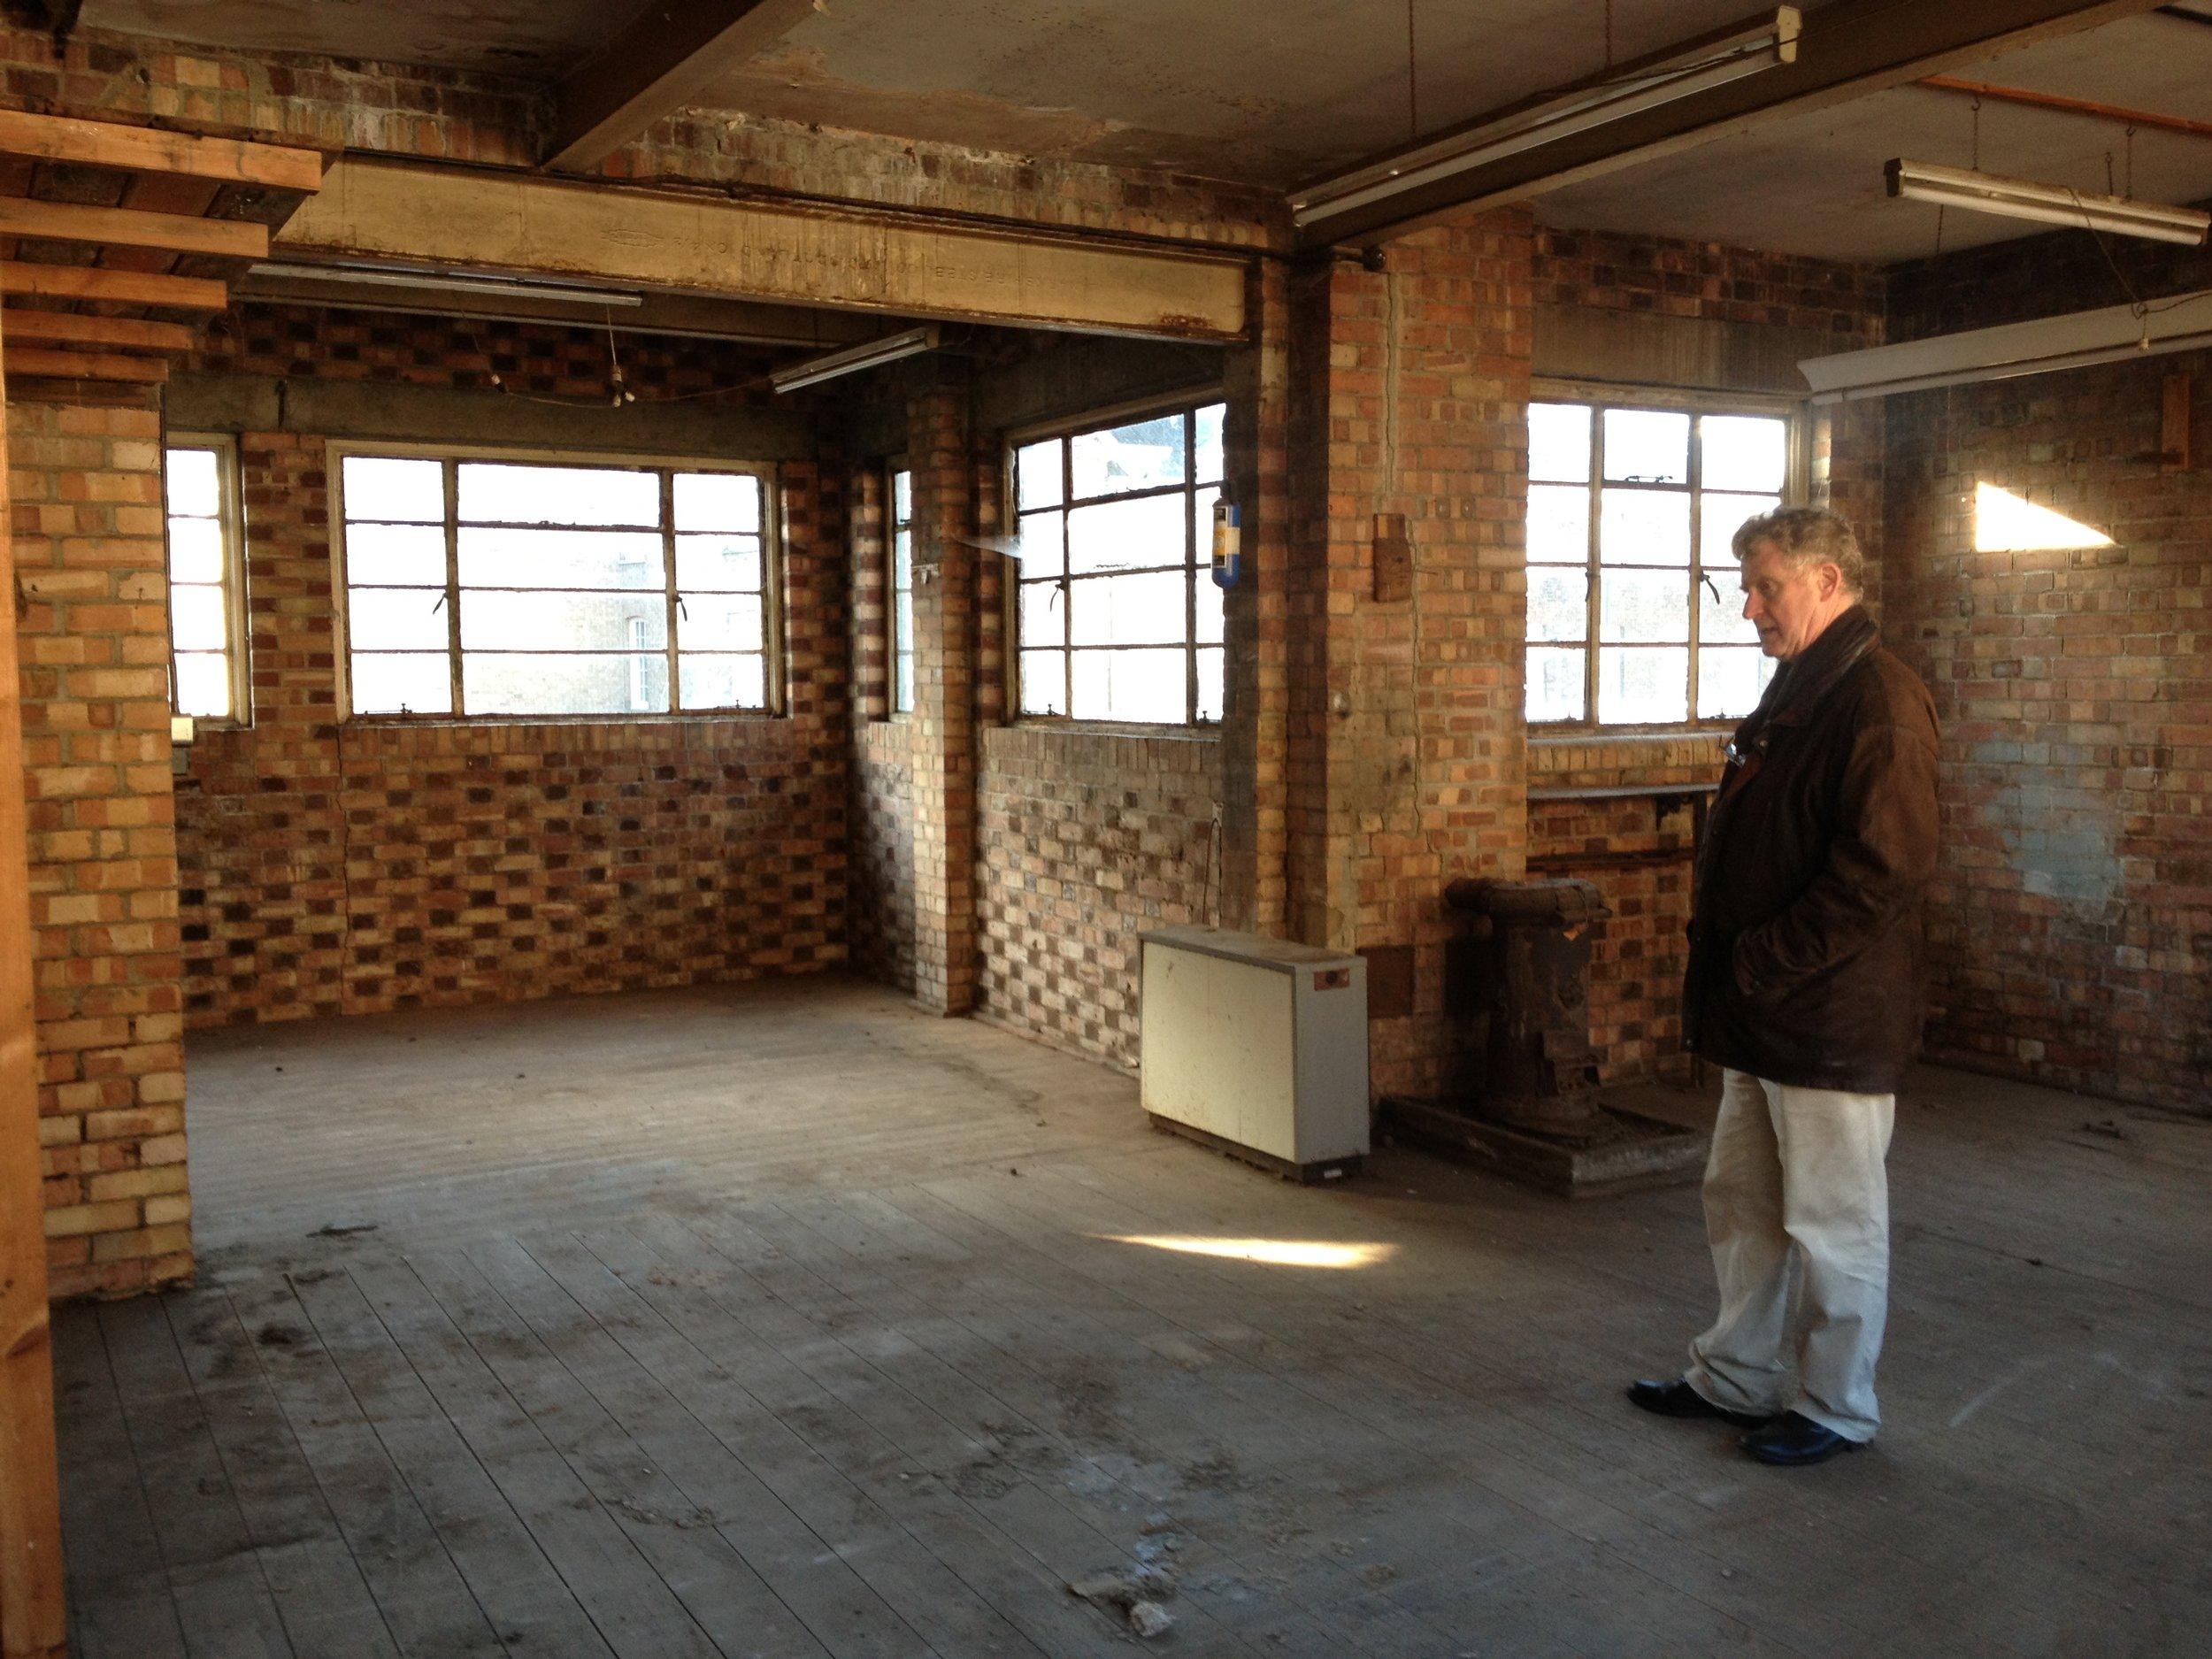 Sandy Heslop contemplating the empty upper floor before construction began.